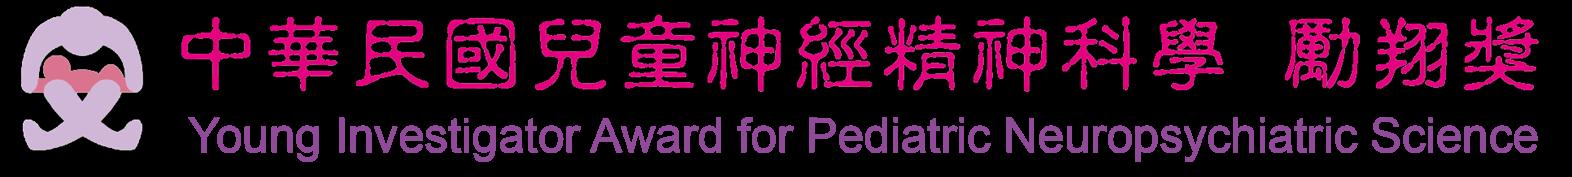 中華民國 兒童神經精神科學 勵翔獎 - Young Investigator Award for Pediatric Neuropsychiatric Science